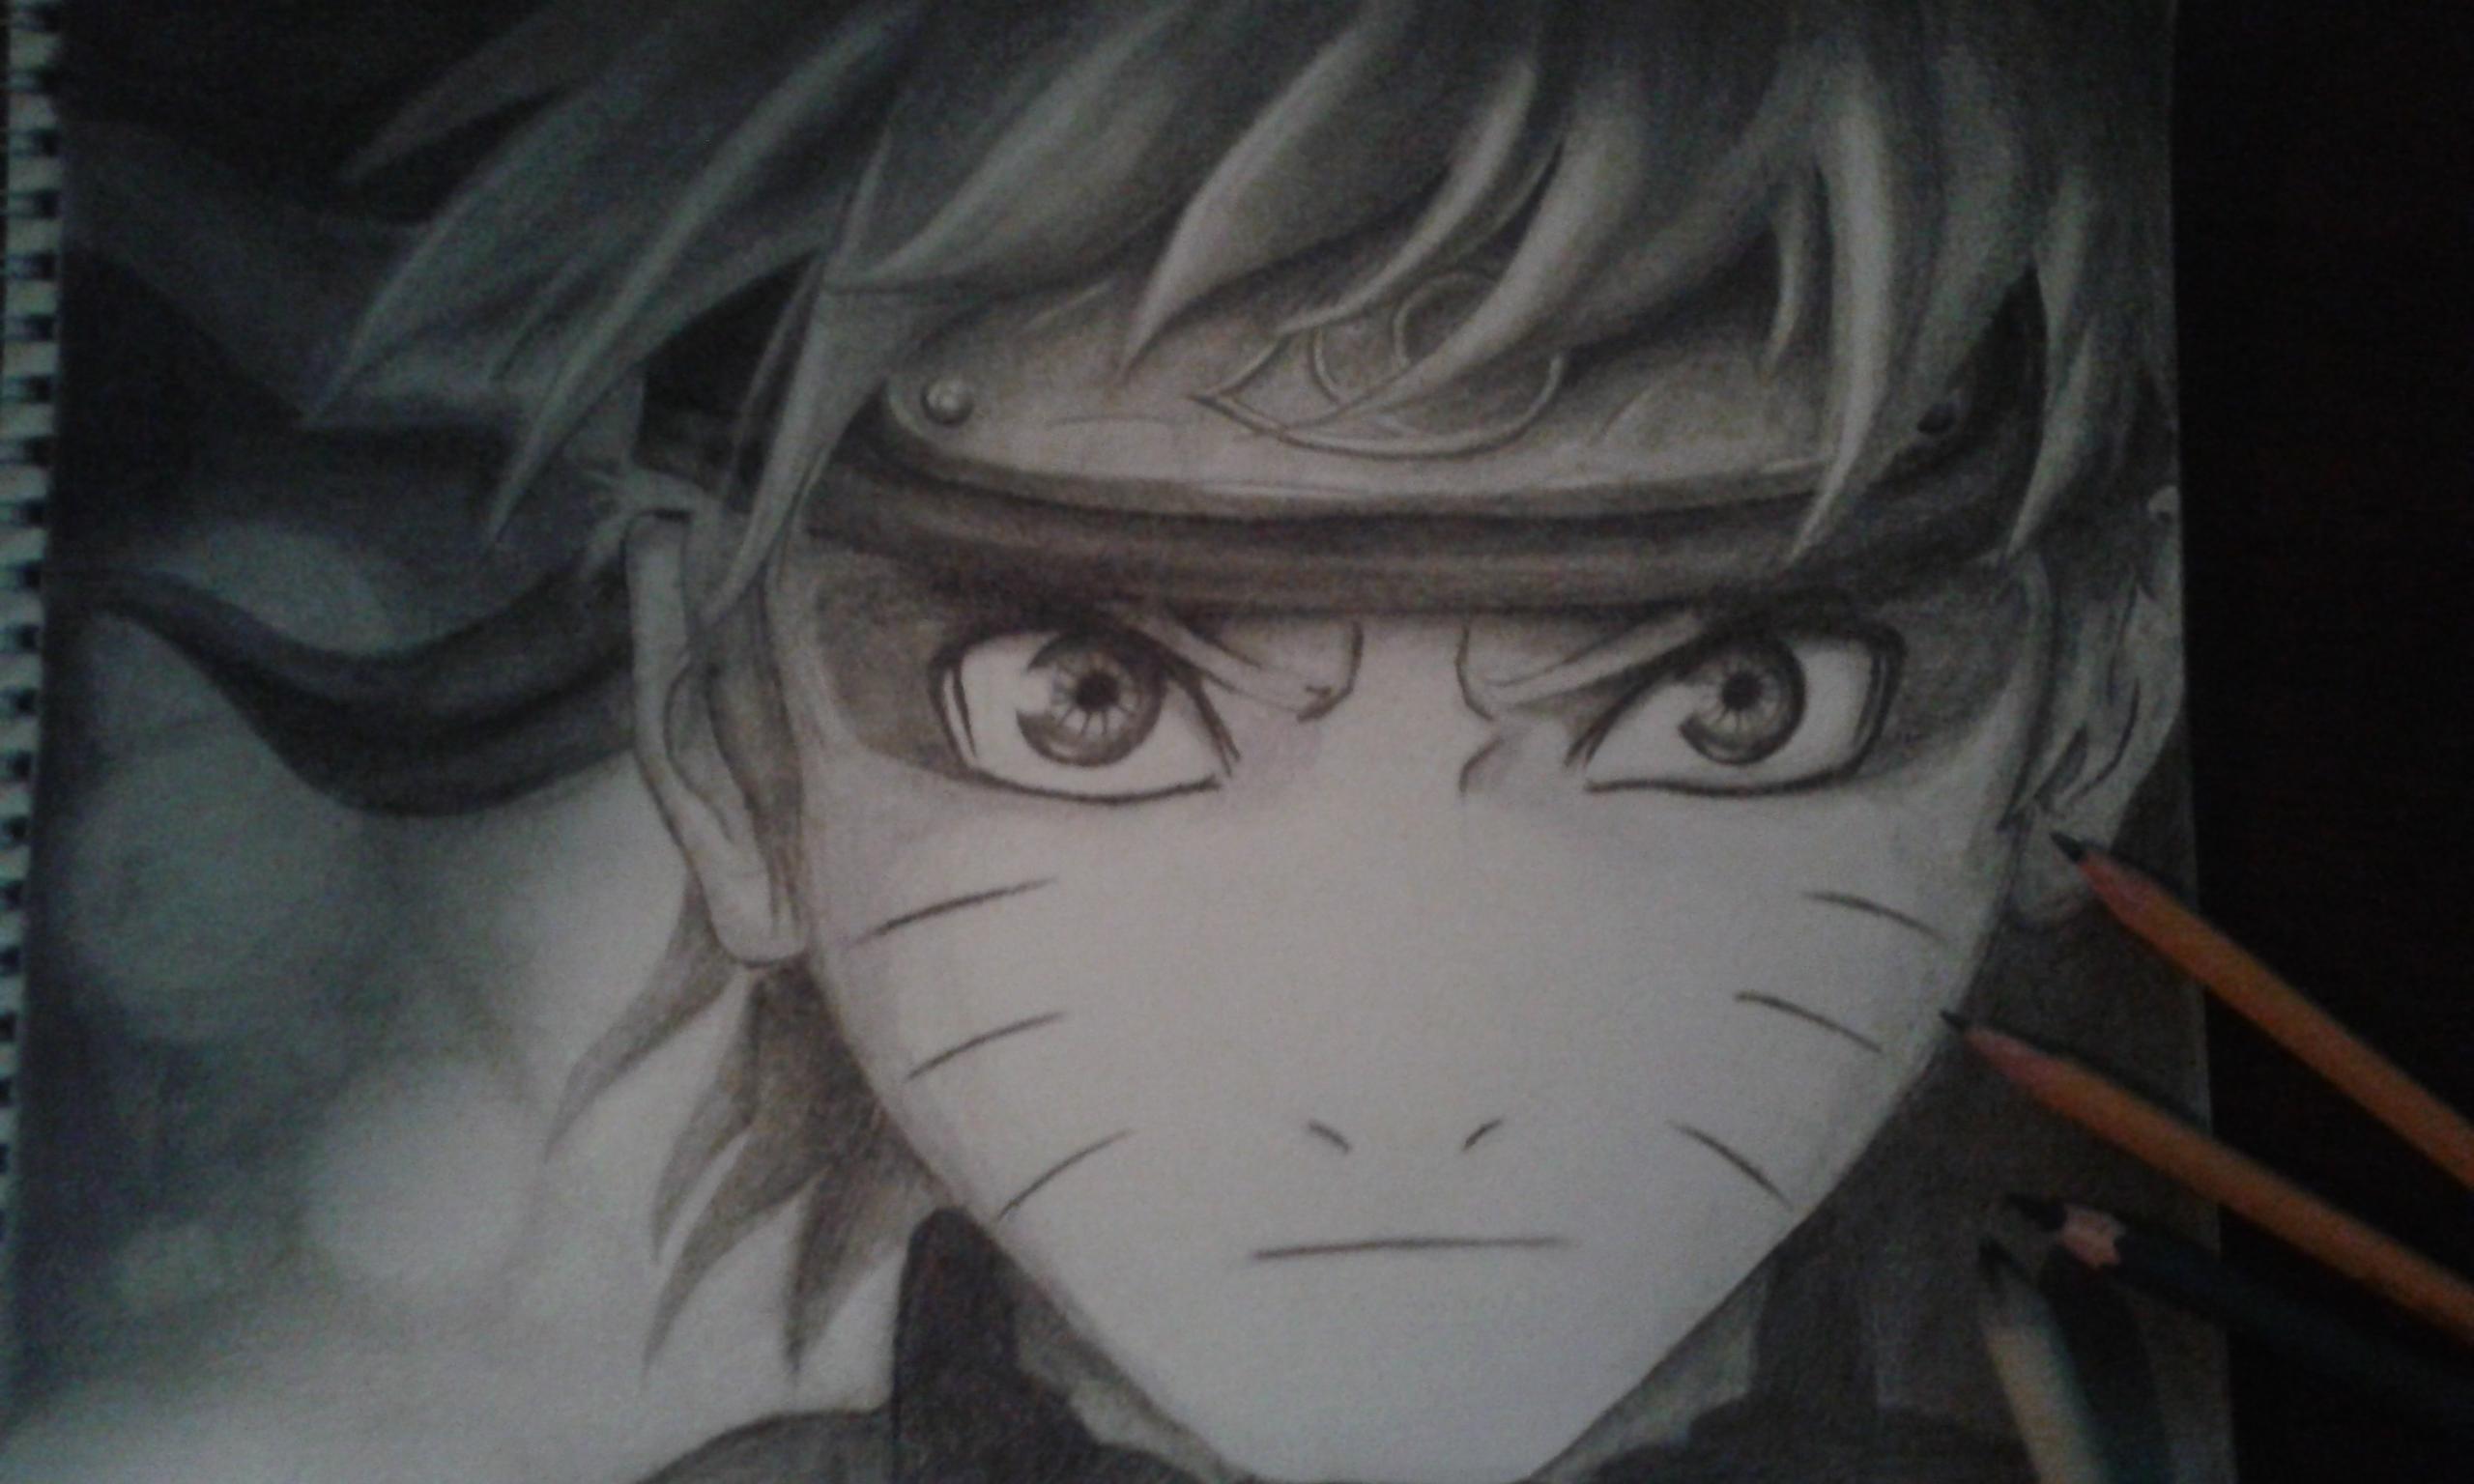 Drawn naruto hand drawn Drawn drawn Naruto Naruto on